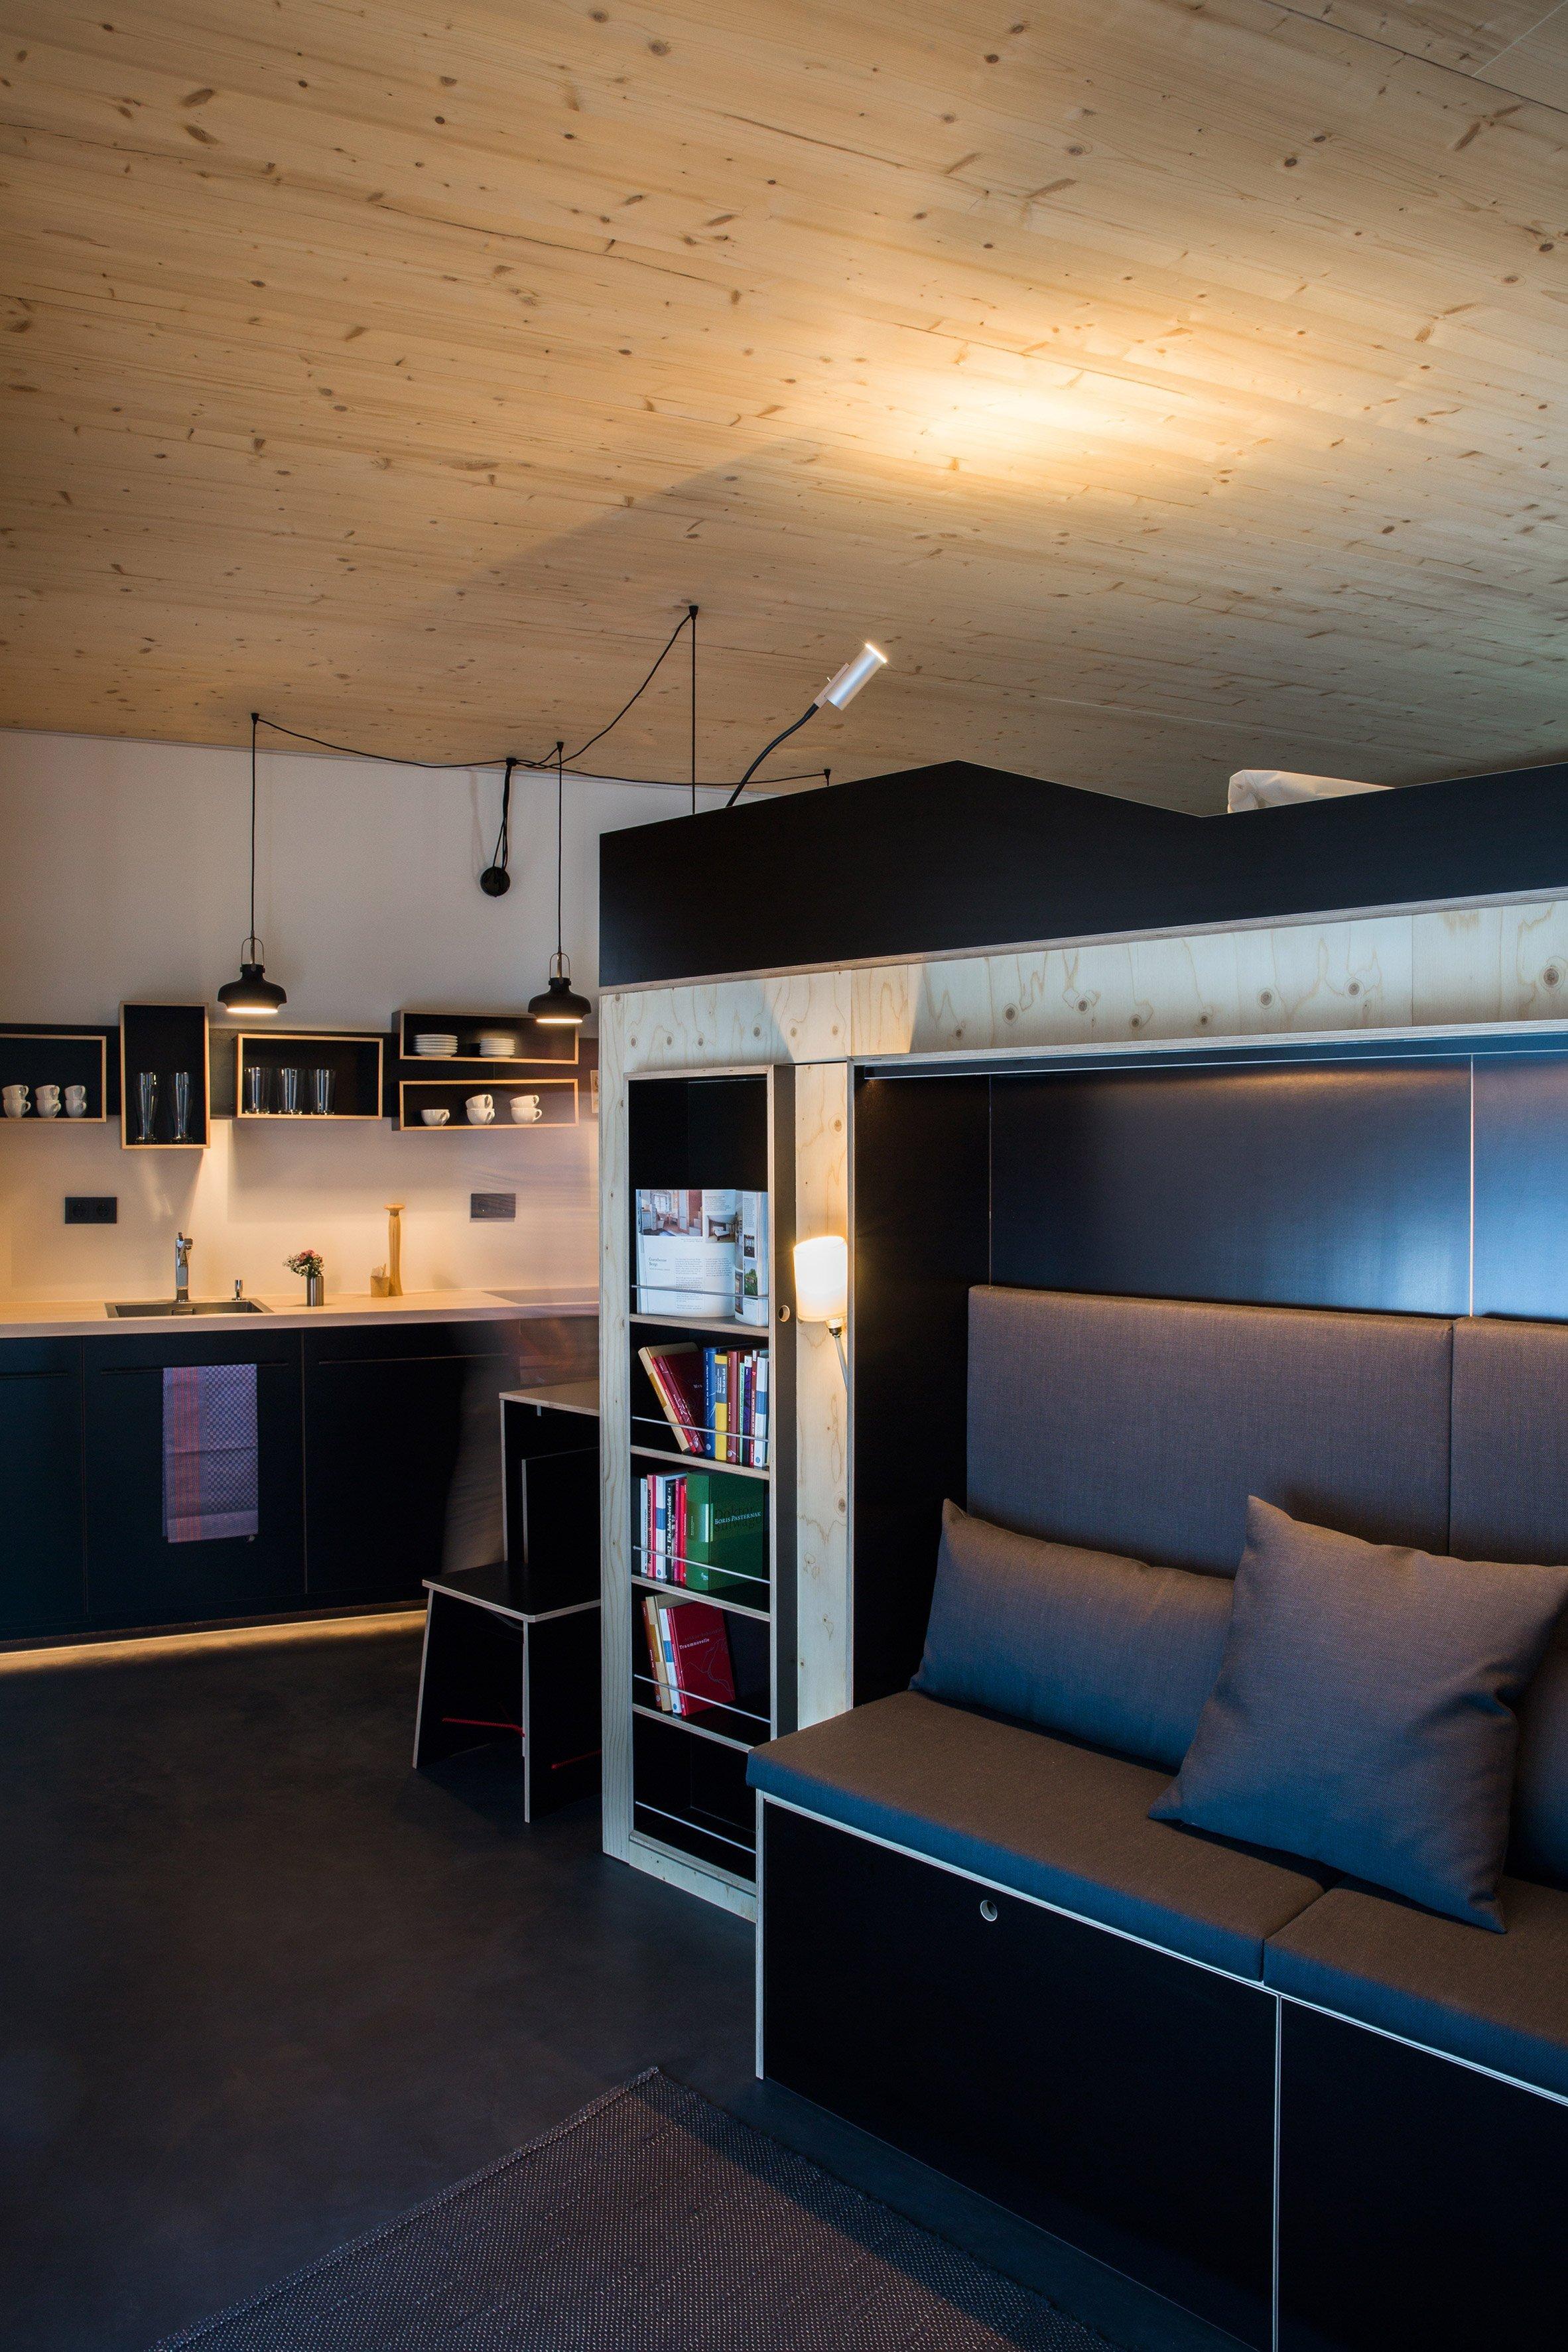 Kammerspiel - Nils Holger Moormann - Germany - Interior 5 - Humble Homes